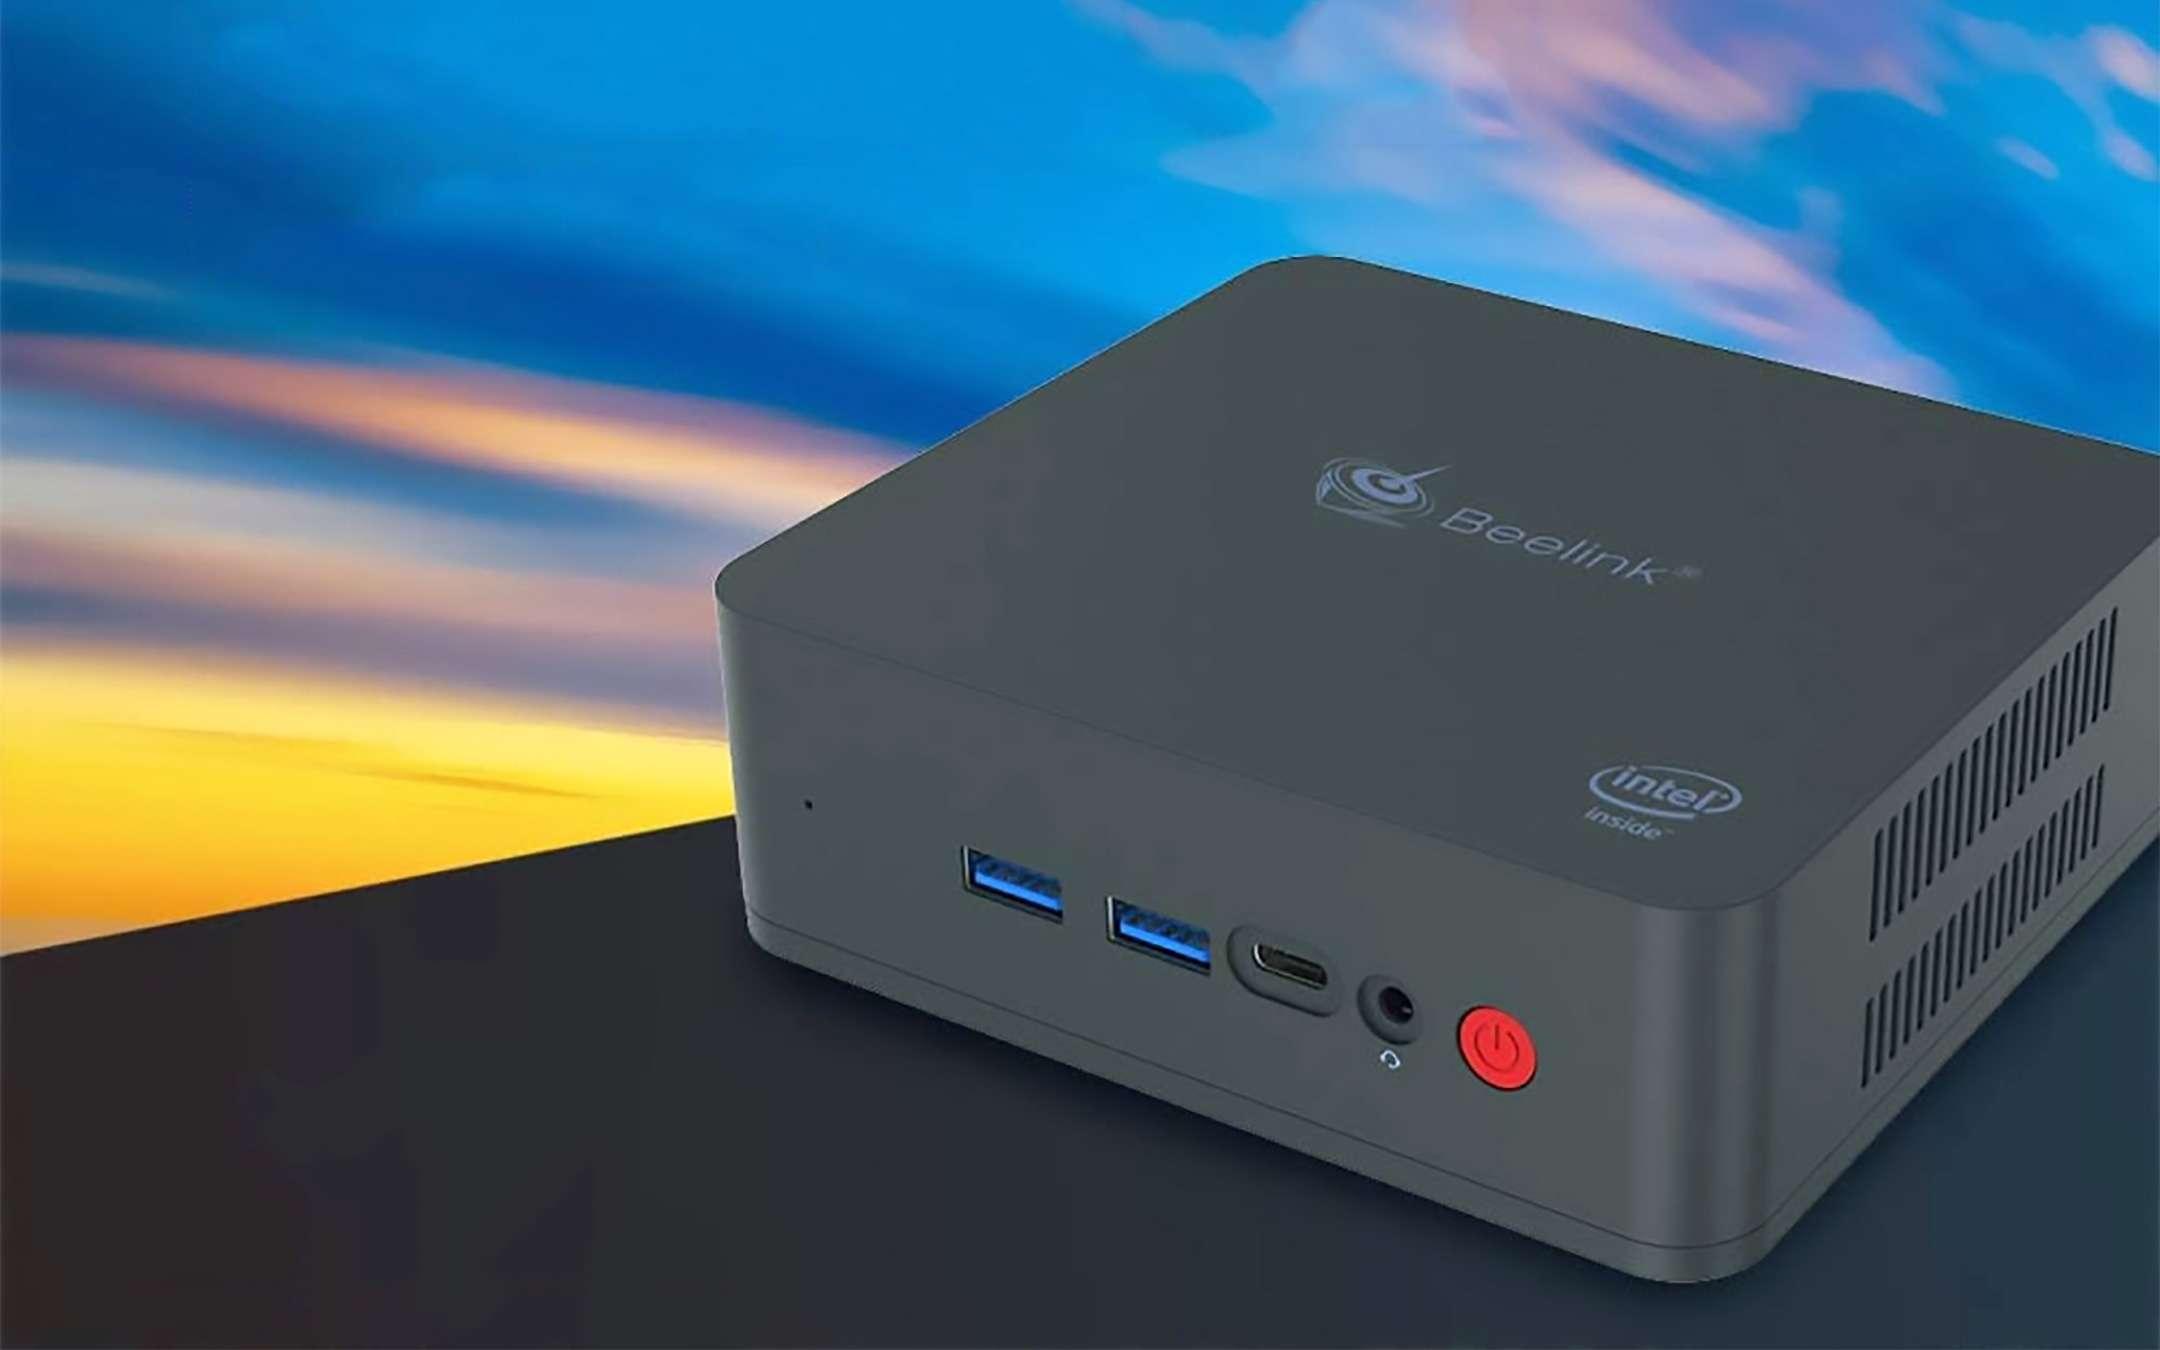 Mini PC, discount: Beelink U55 with Intel Core at -25%